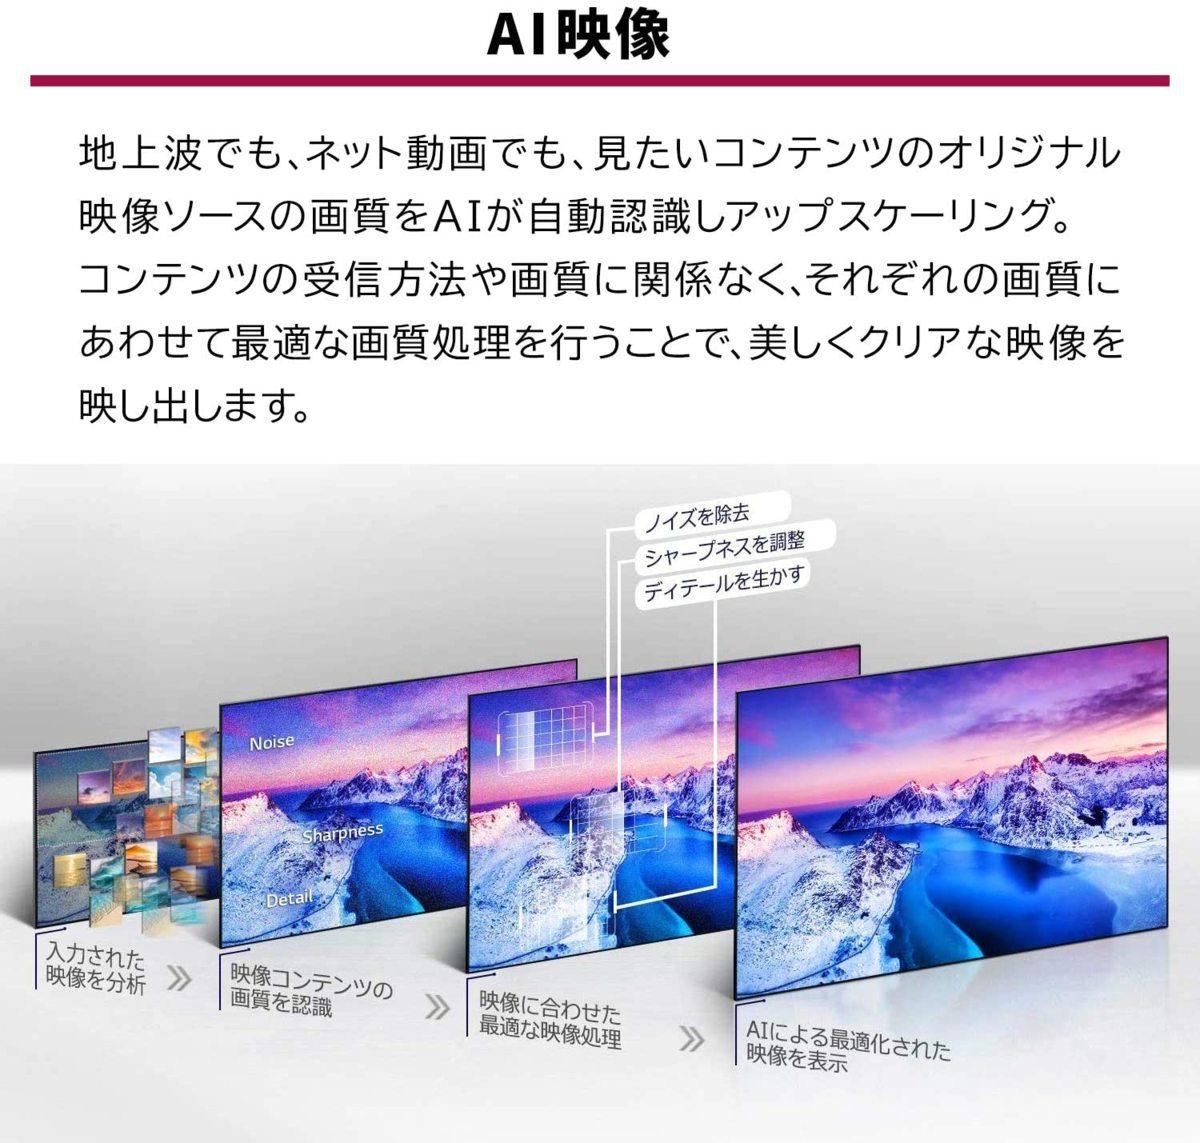 LG 55V型 4Kチューナー内蔵有機ELテレビ OLED55BXPJA 無線LAN/Bluetooth/Dolby Atmos/YouTube/Amazonプライム/Netflix 2021/4から1年保証_画像3